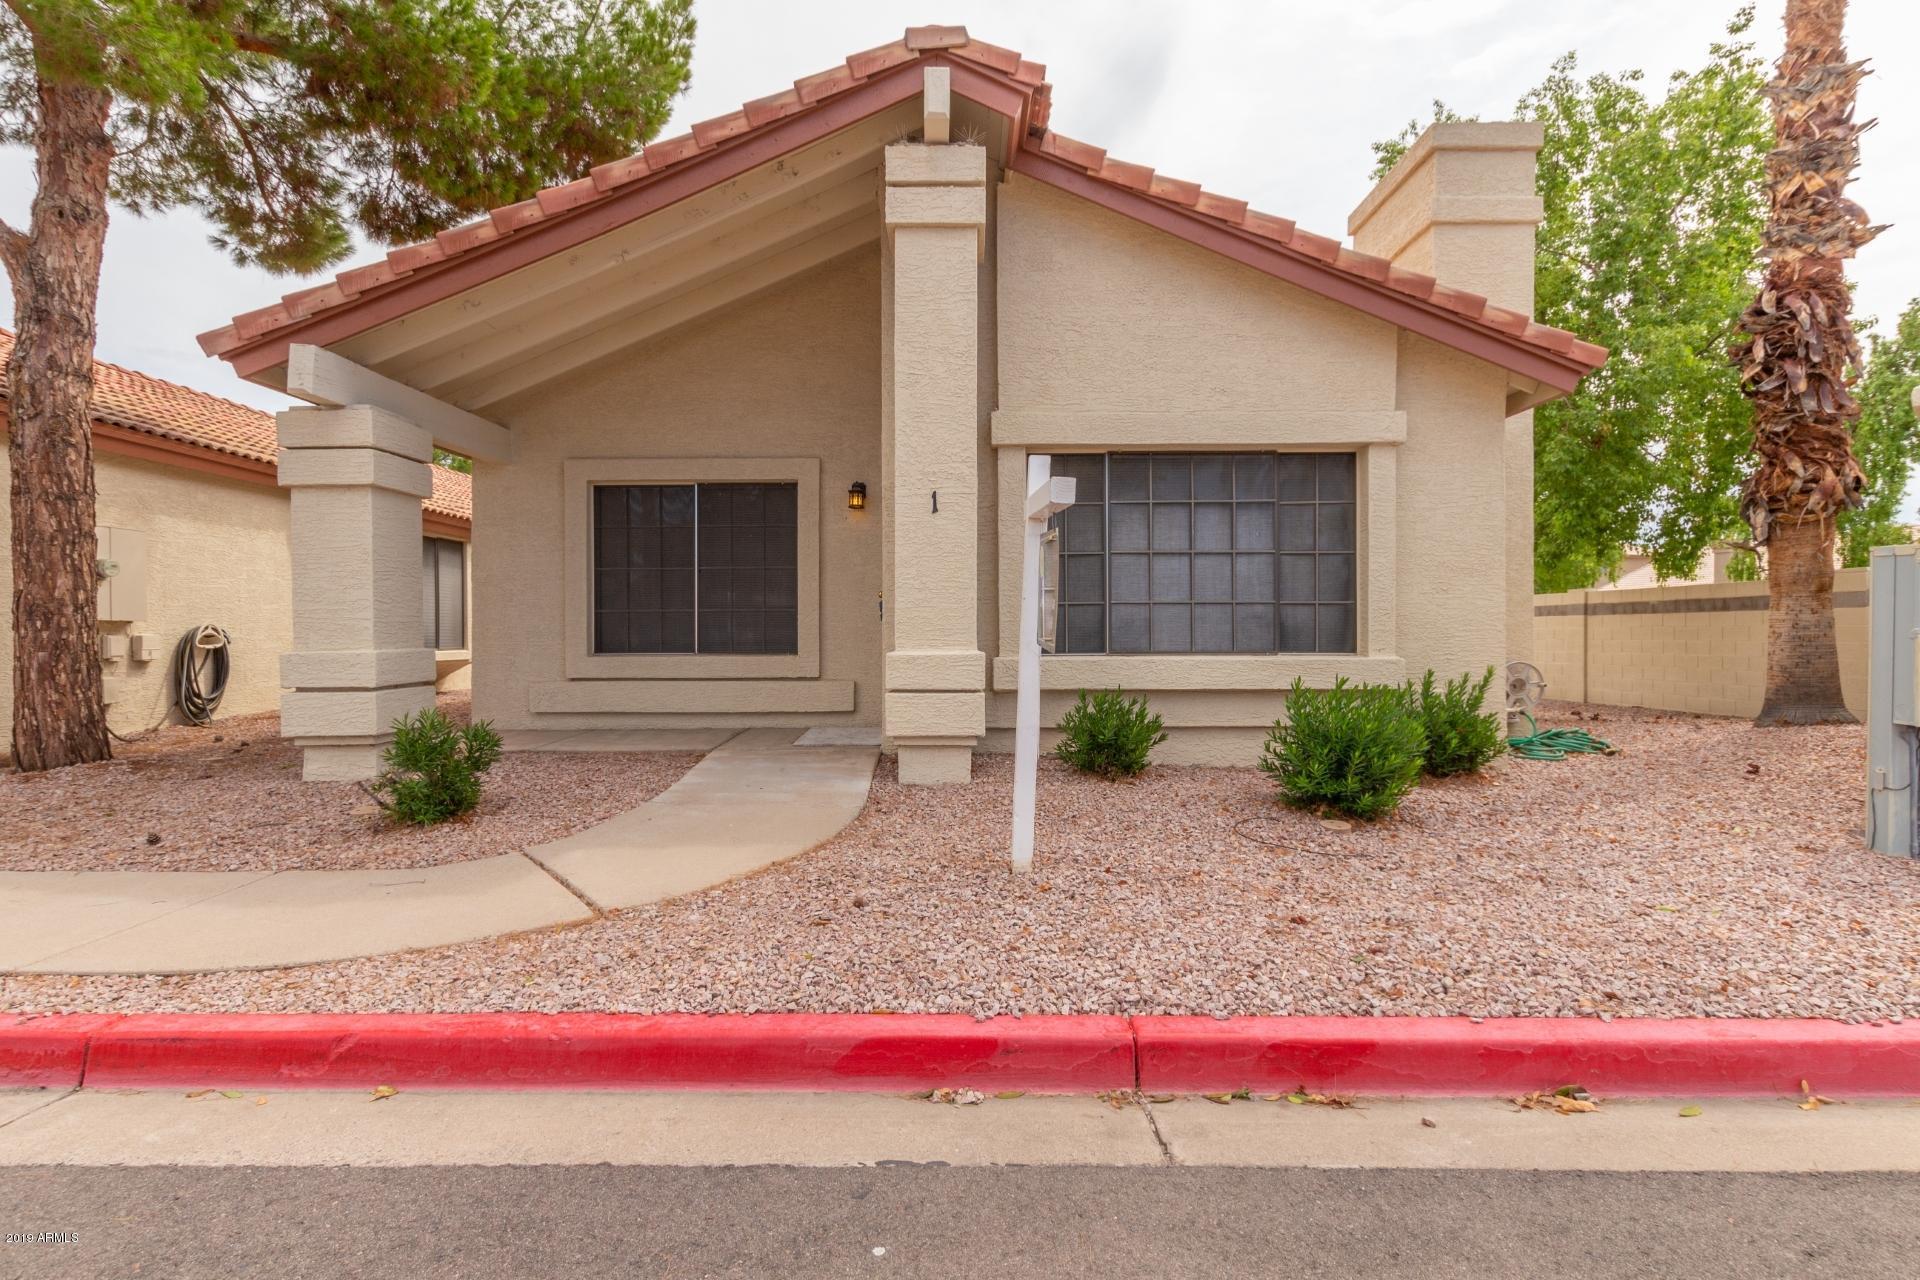 Photo of 1120 N VAL VISTA Drive #1, Gilbert, AZ 85234